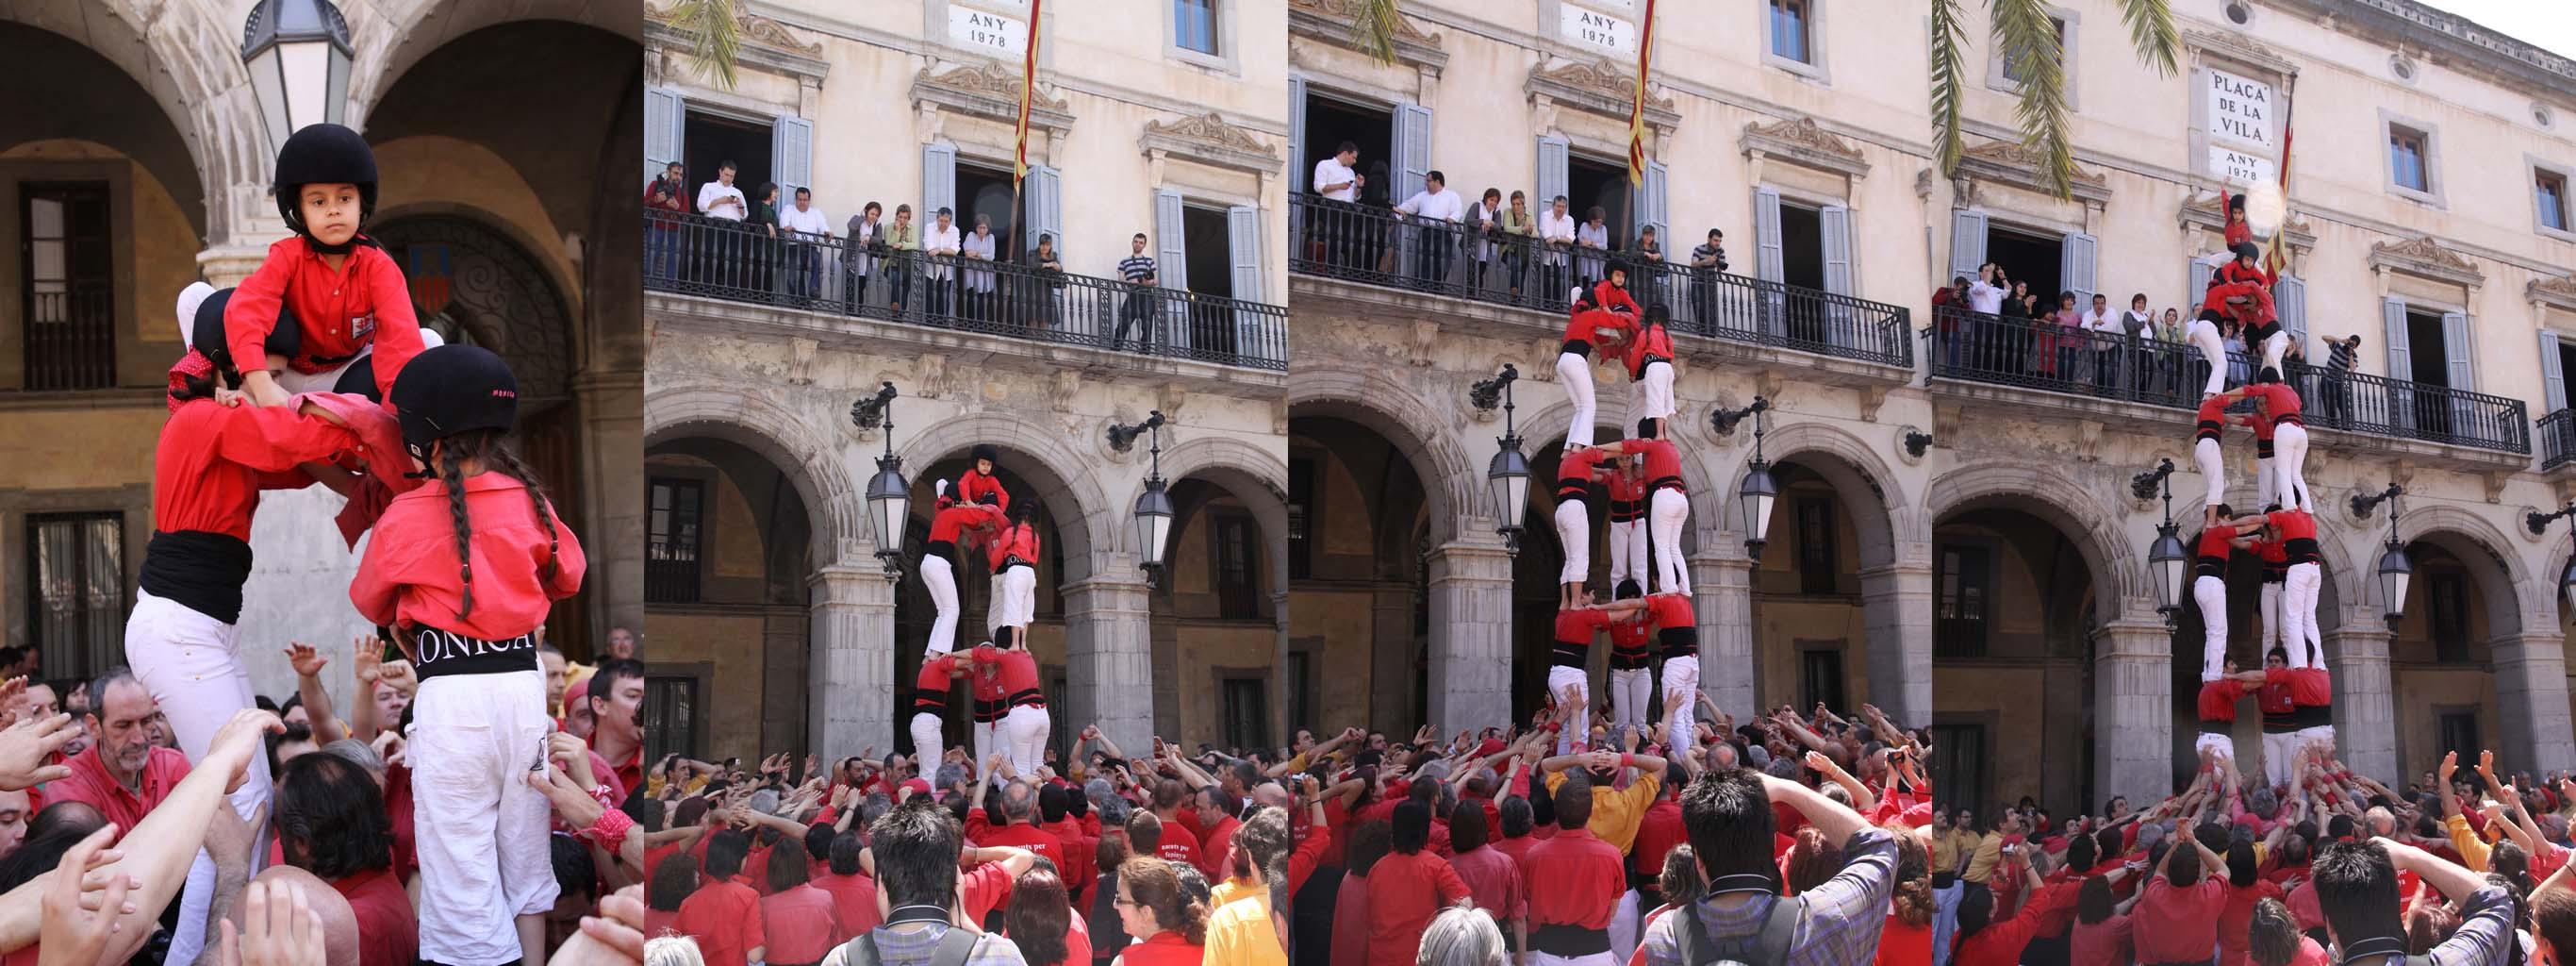 castells castellers de Barcelona